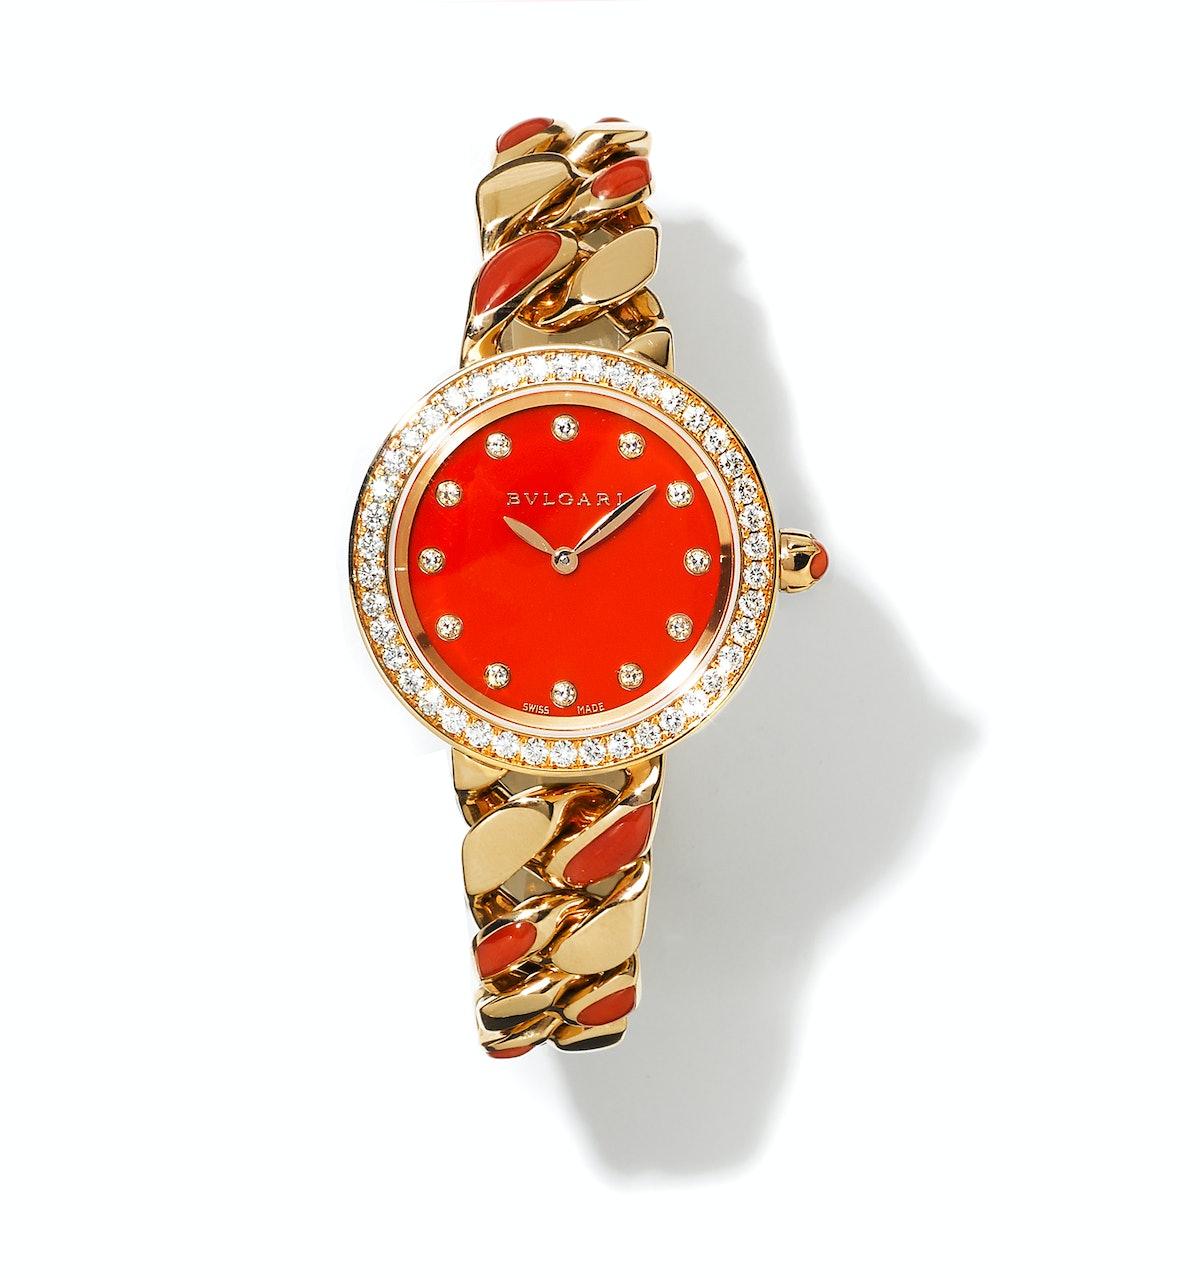 Bulgari gold and diamond watch